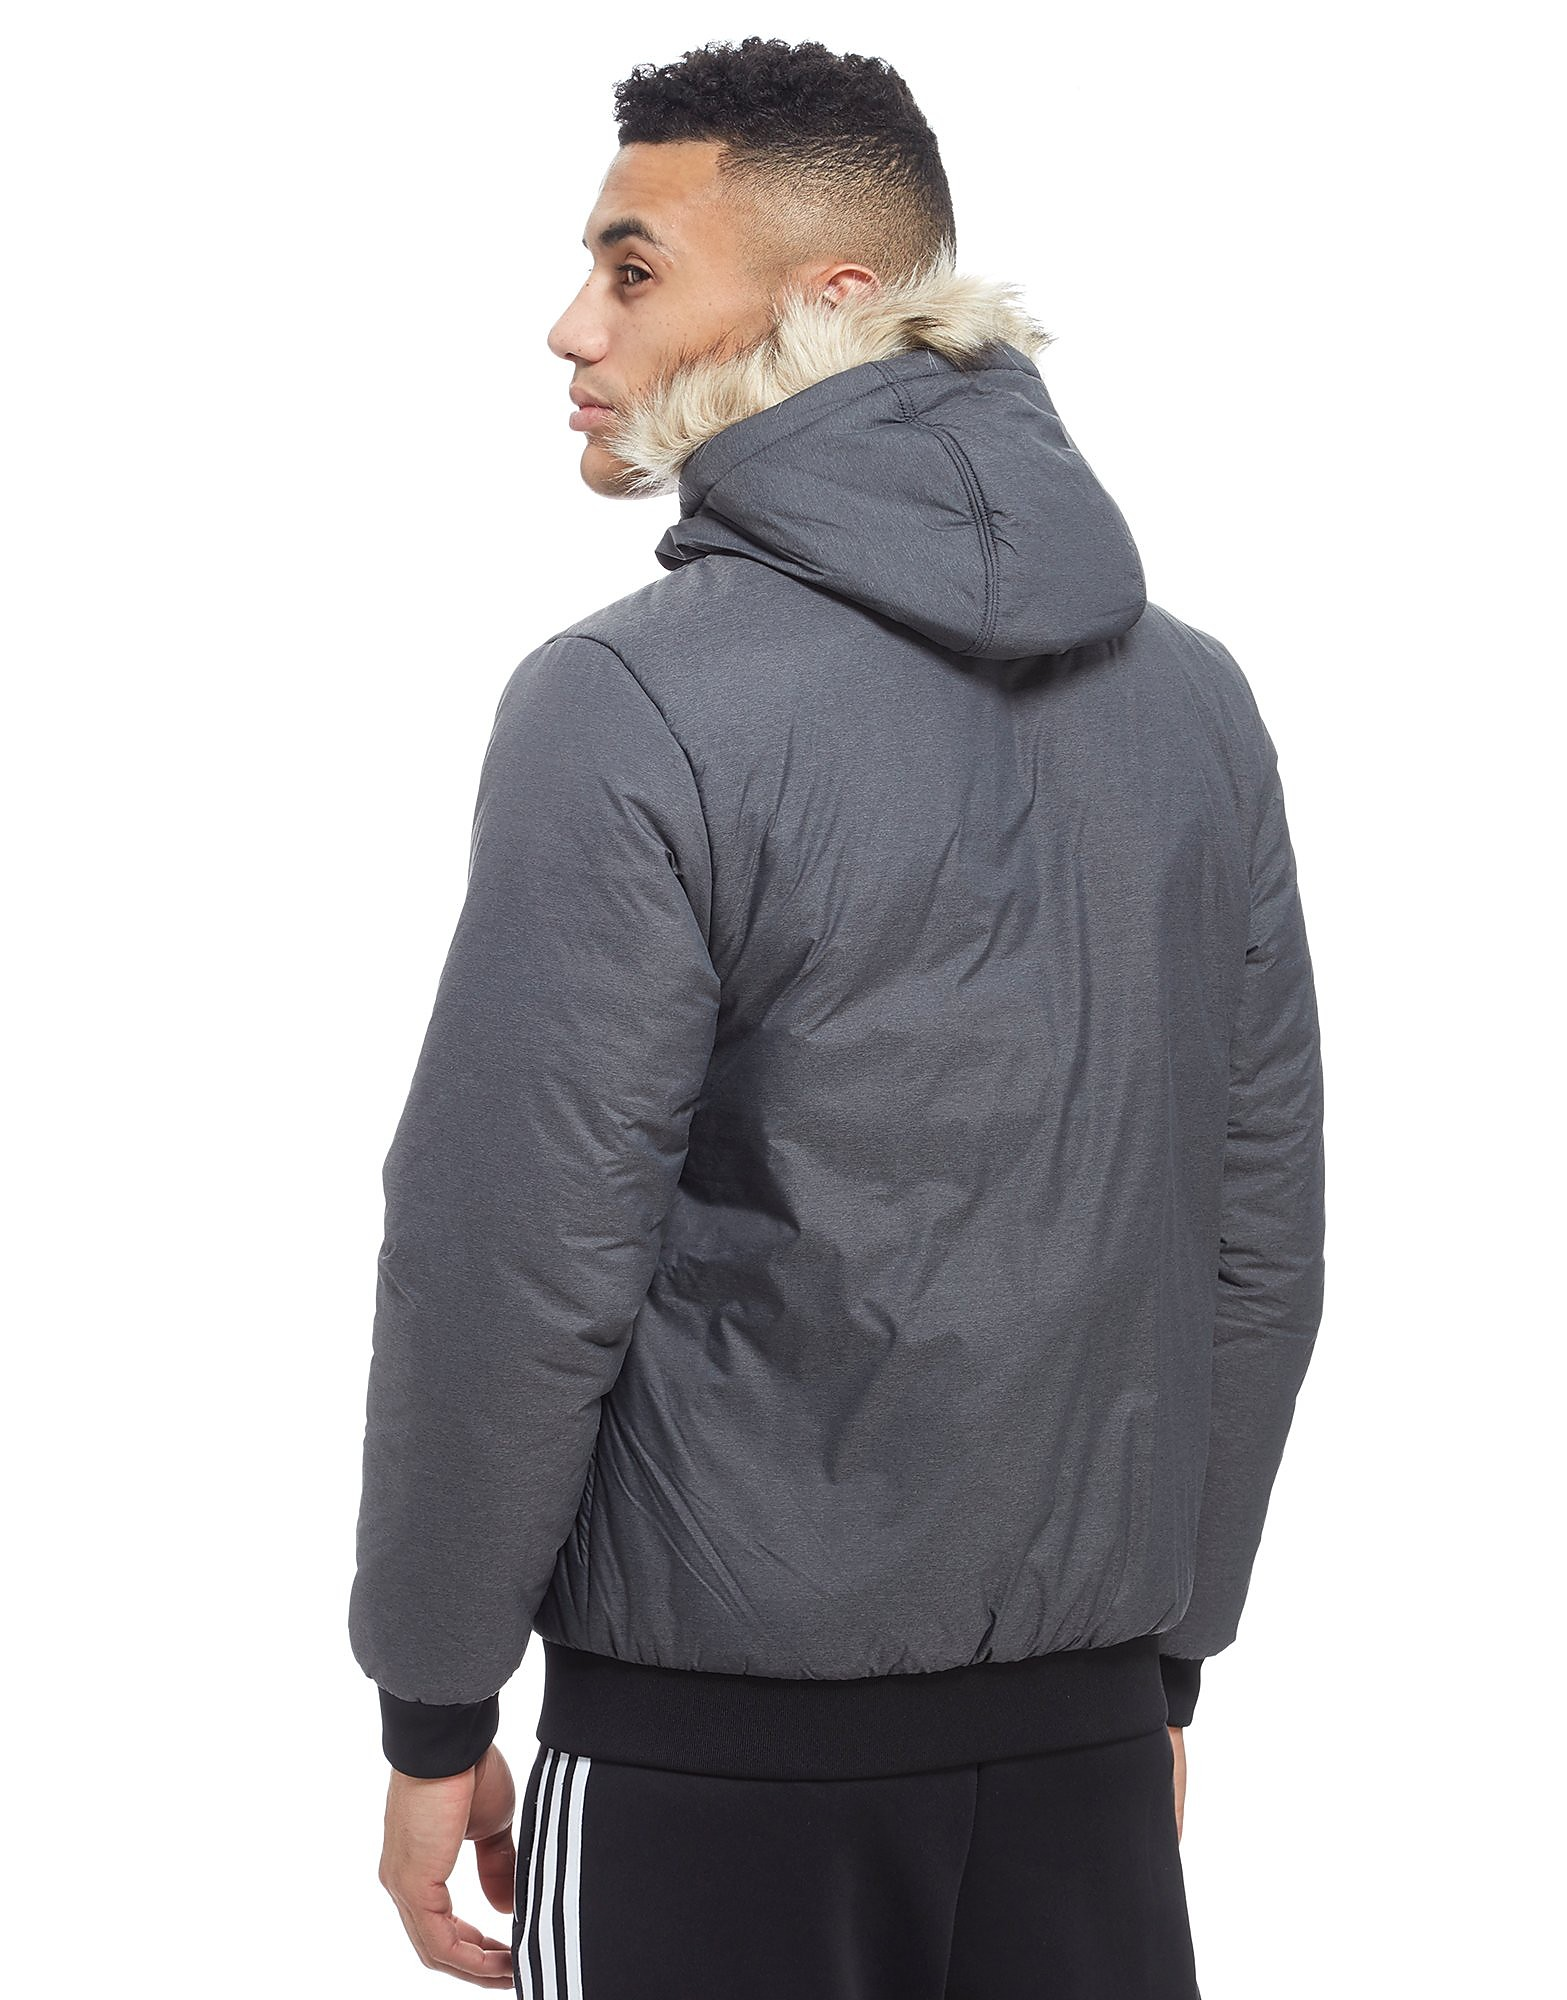 adidas Originals Trefoil Fur Parka Jacket